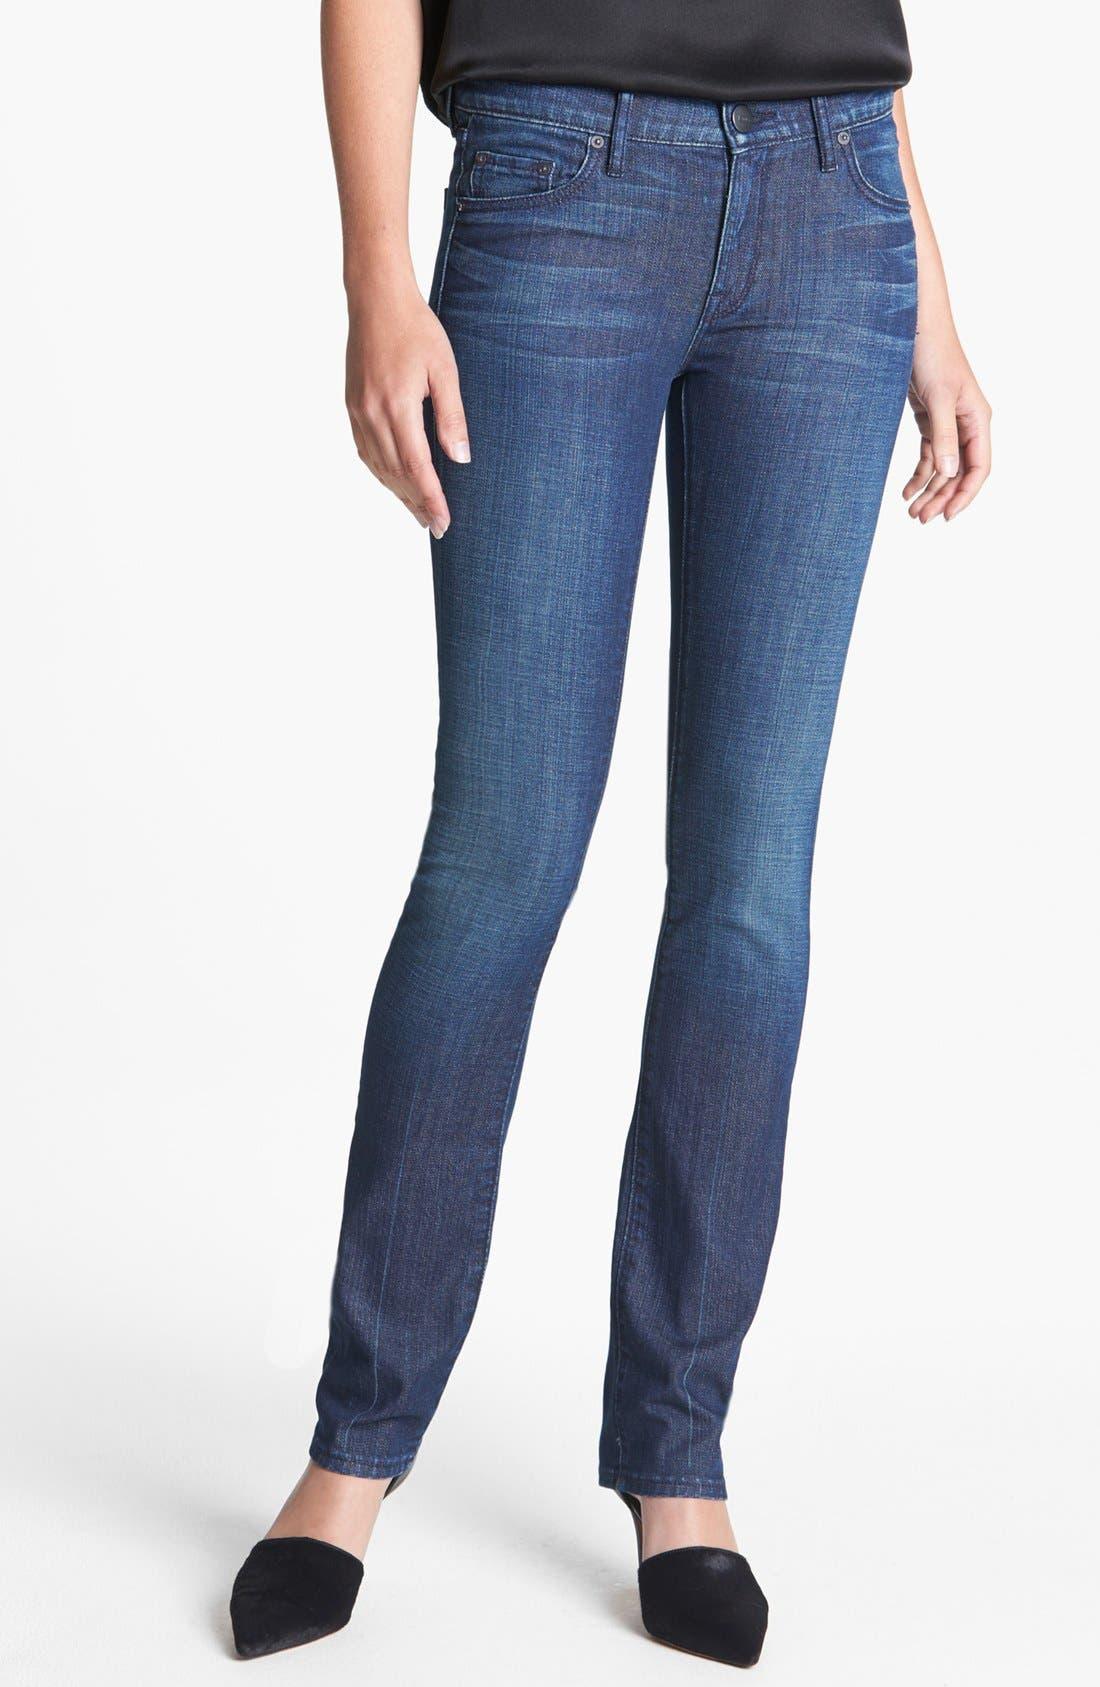 Alternate Image 1 Selected - Vince 'Finley' Cigarette Leg Jeans